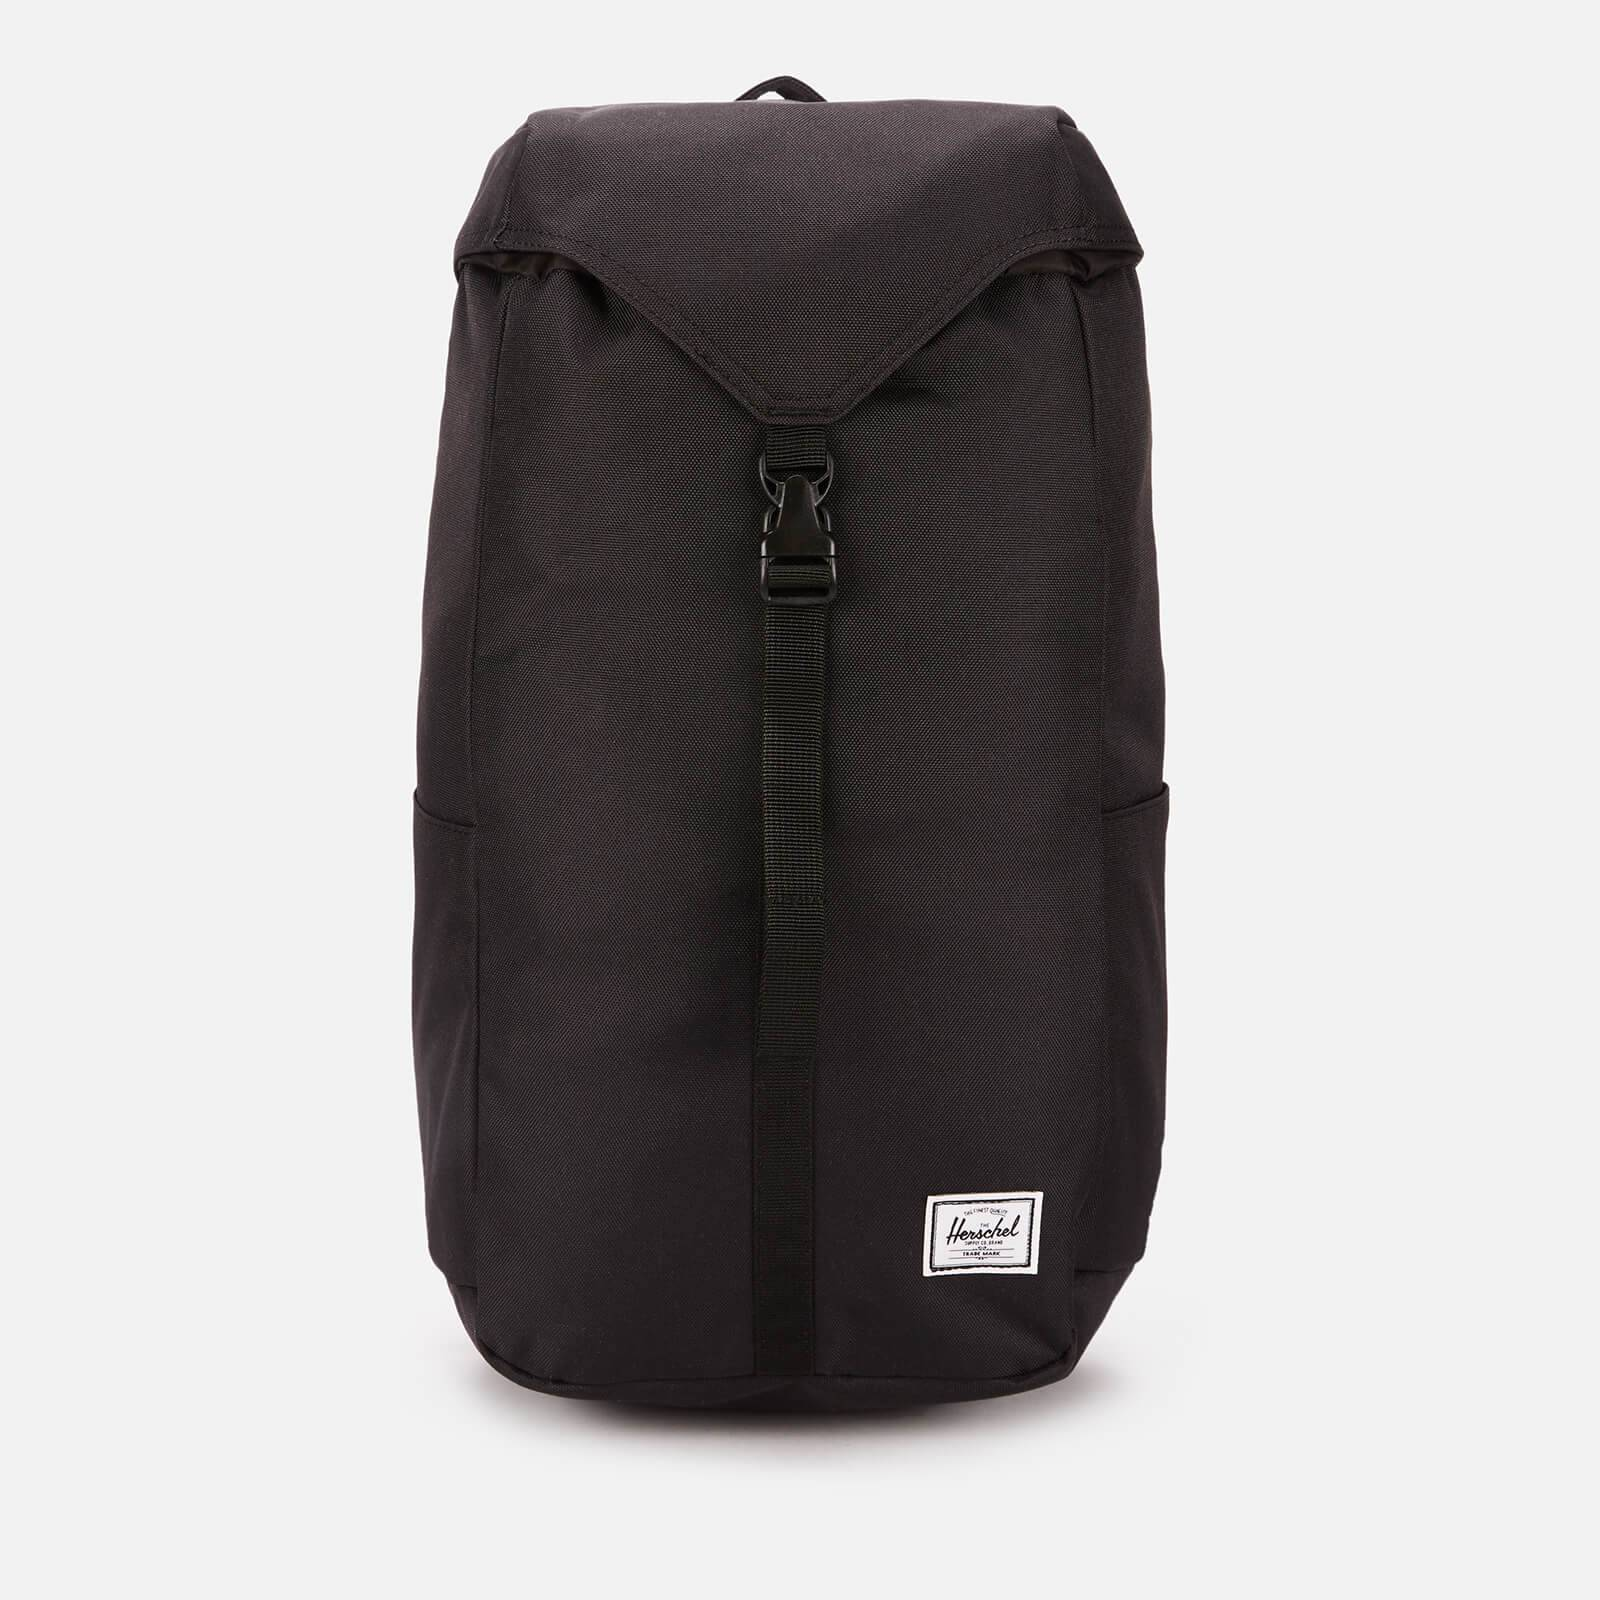 Herschel Supply Co. Men's Thompson Backpack - Black